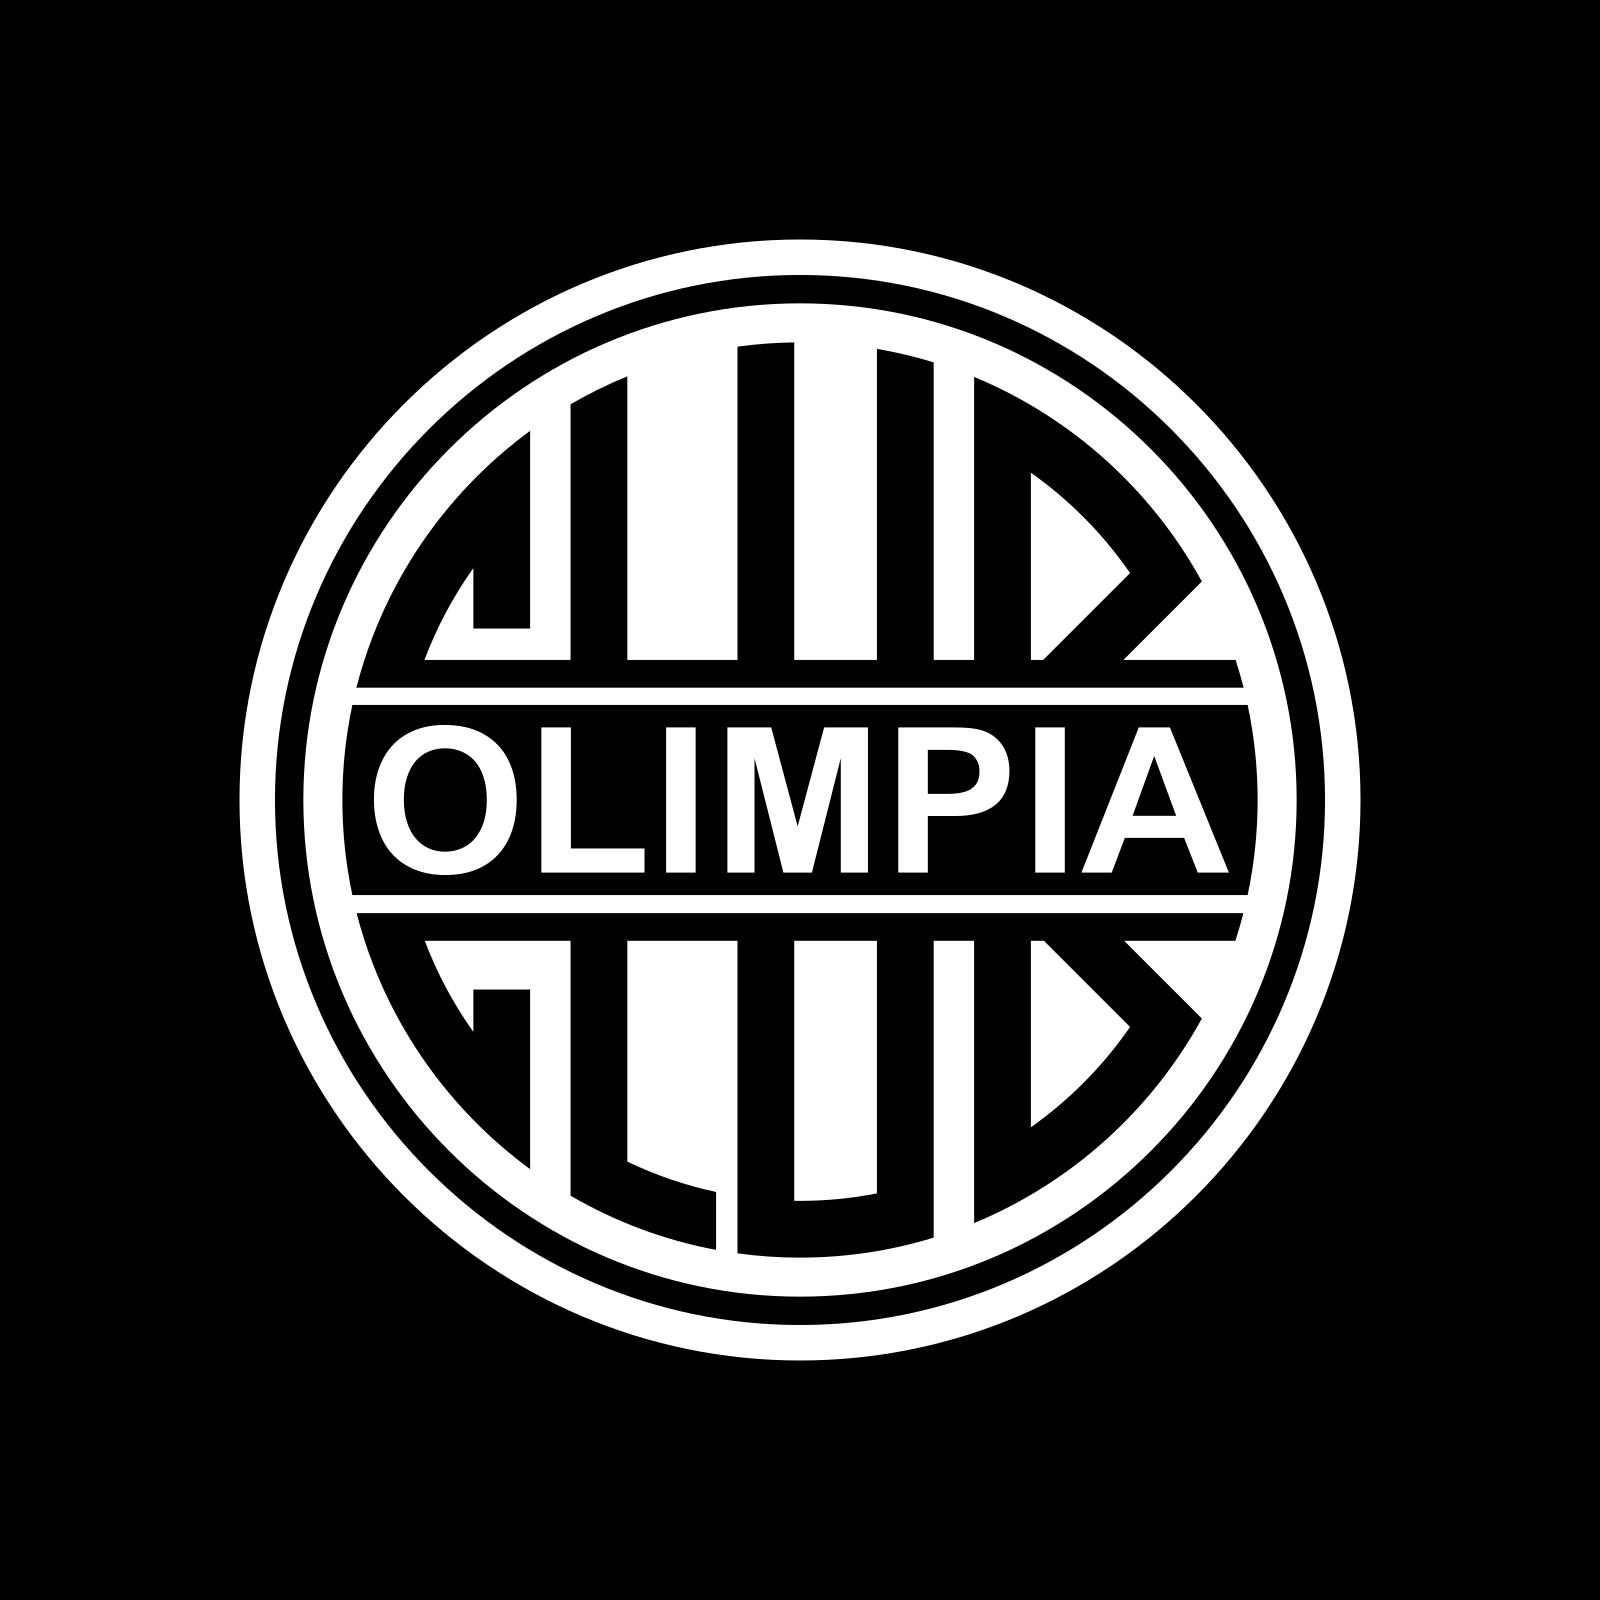 olimpia logo escudo 2 - Club Olimpia Logo